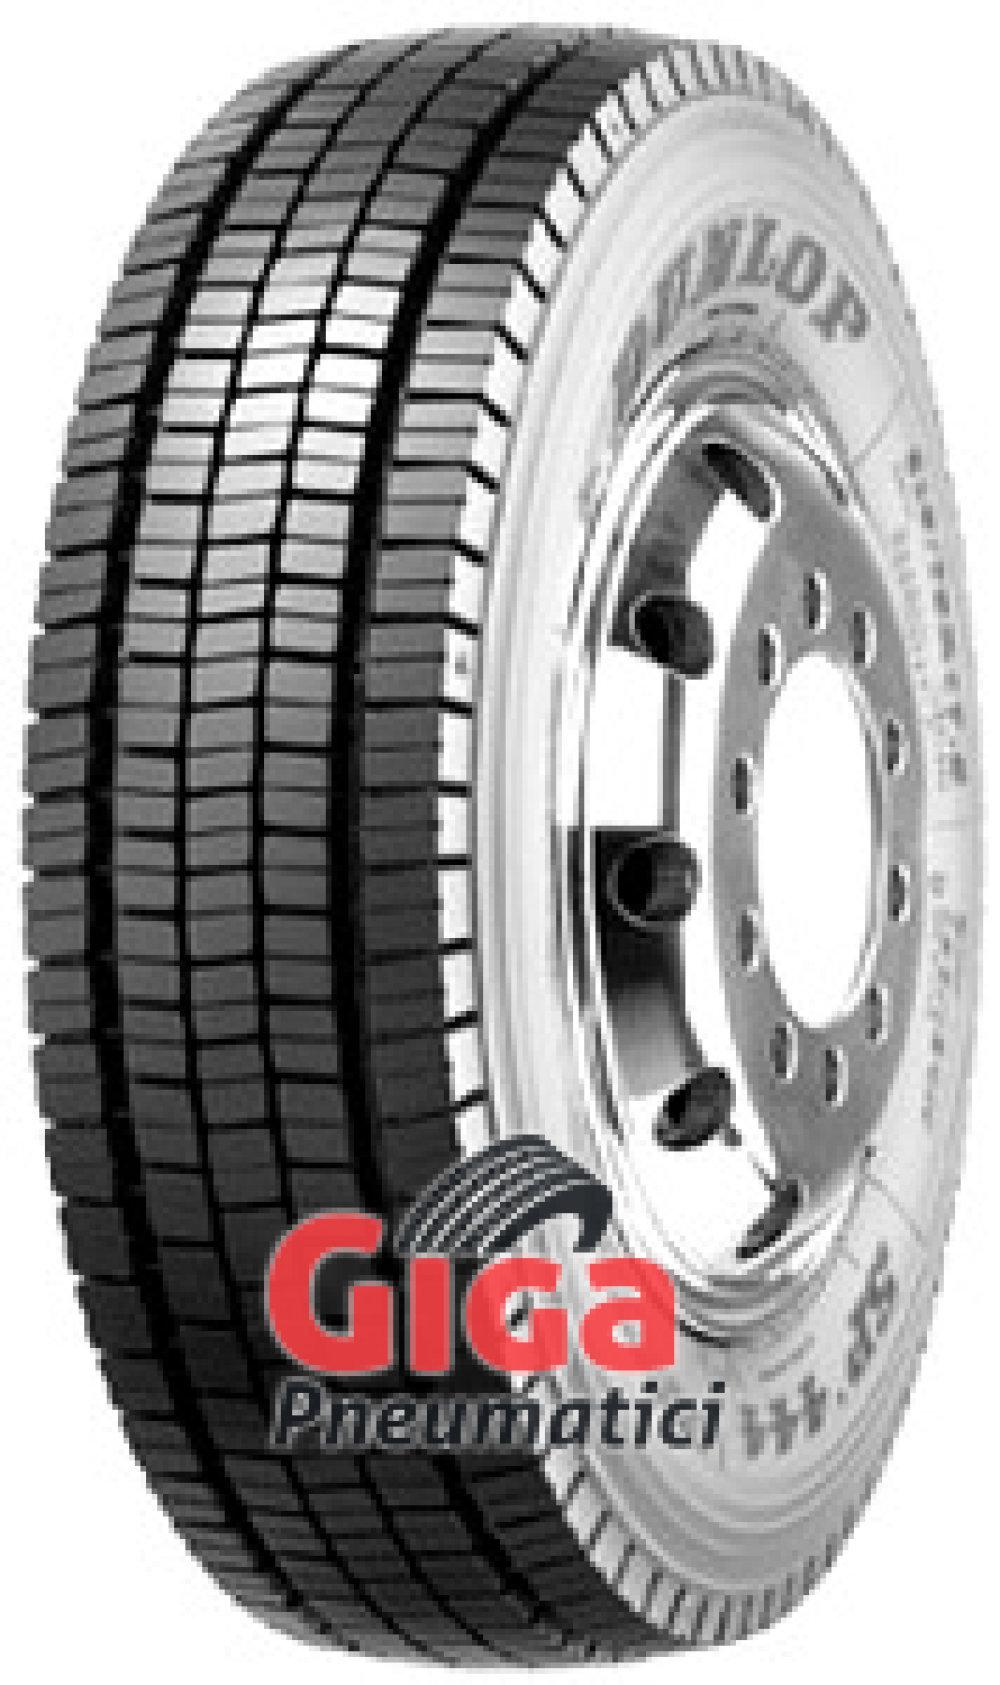 Dunlop Next Tread NT244 ( 265/70 R19.5 140/138M )